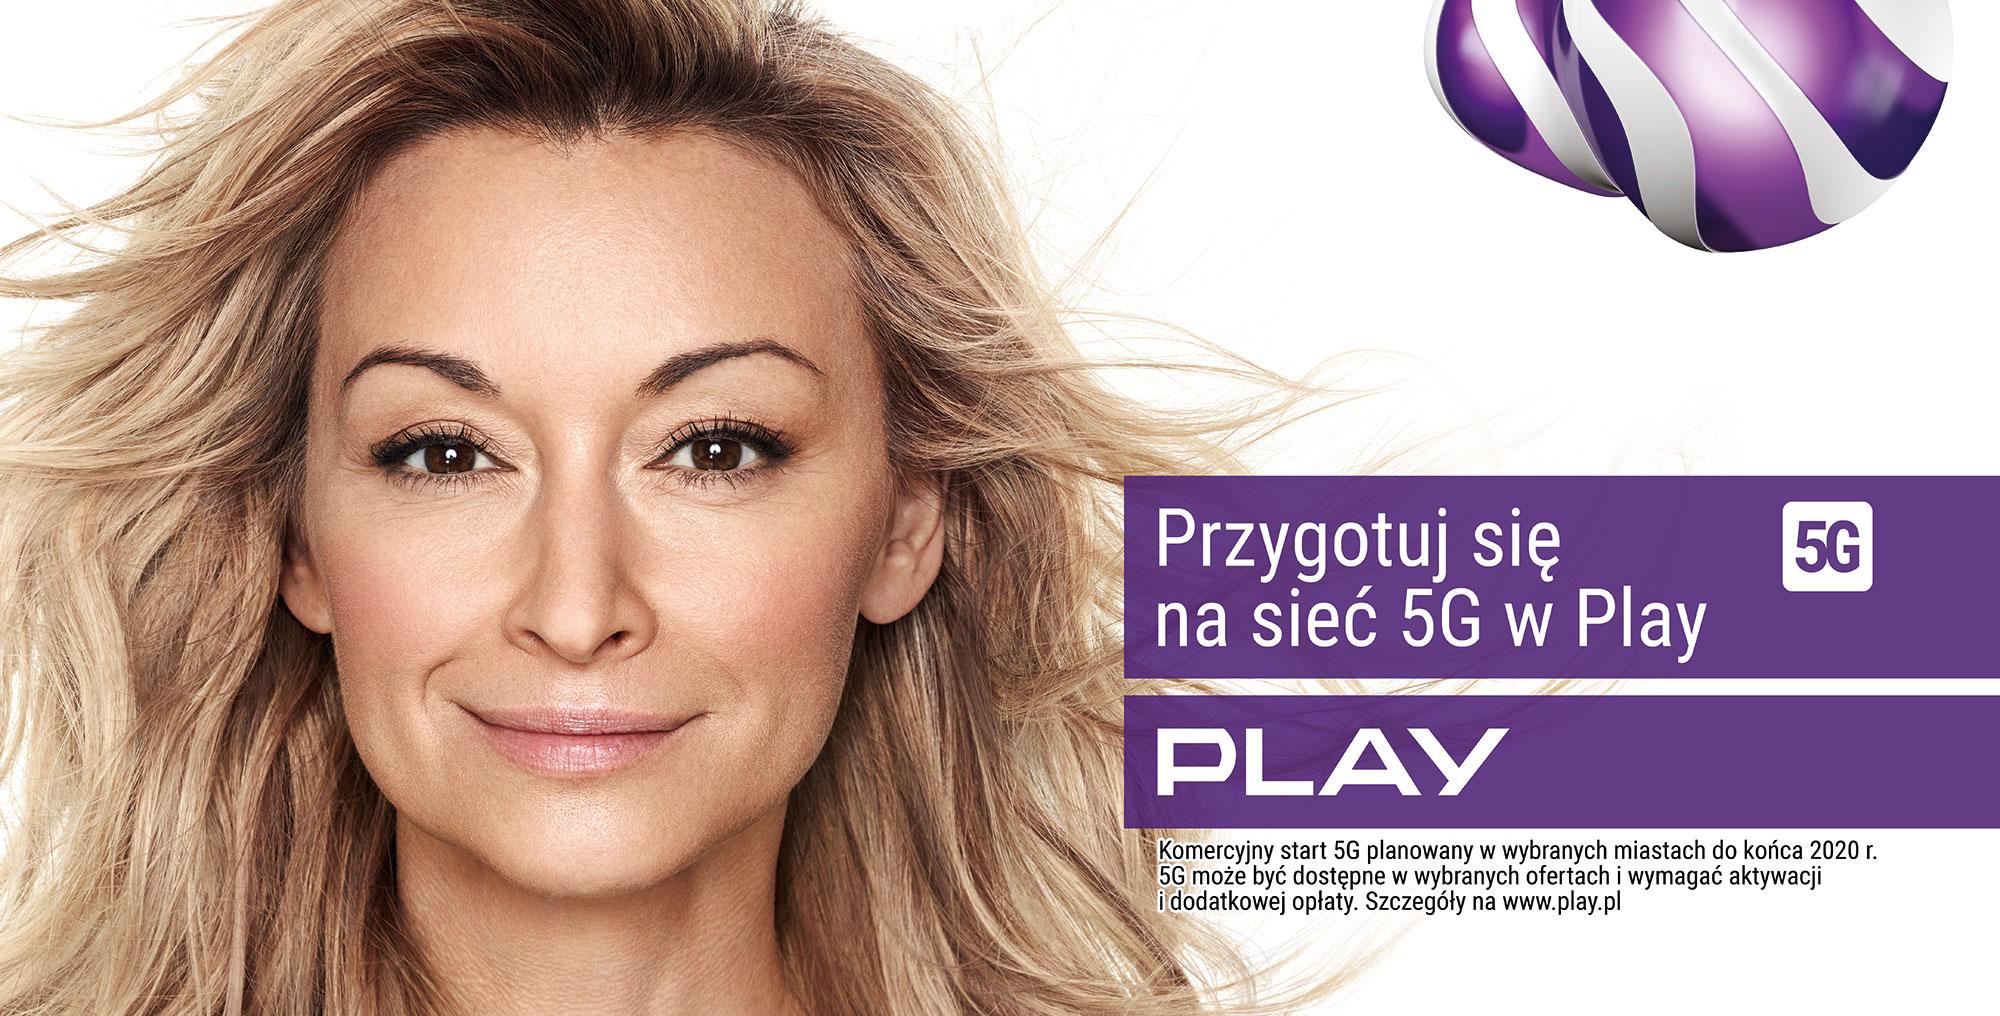 Promocja w Play